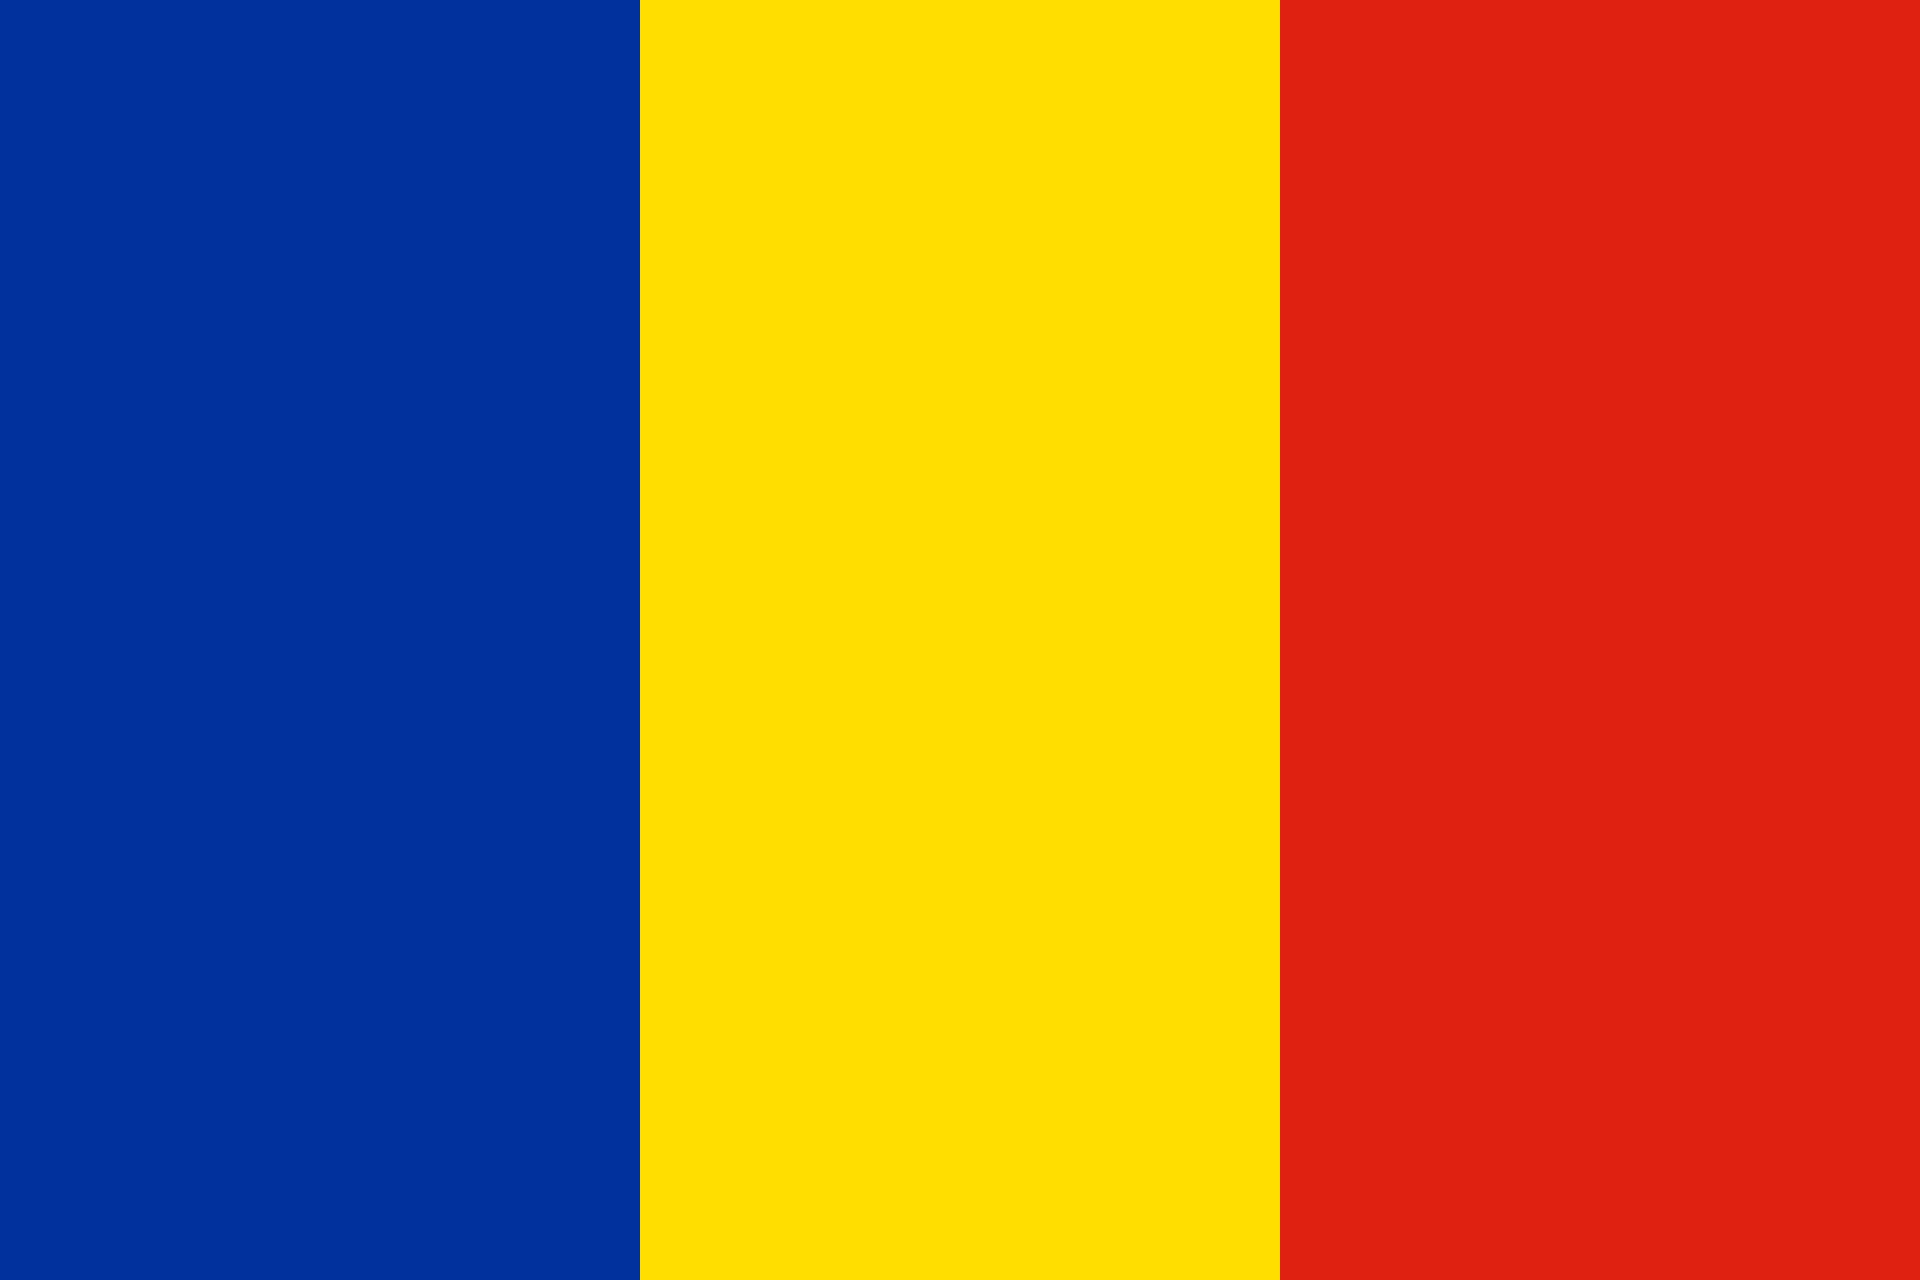 Romania Romania Flag Flags Of The World National Flag